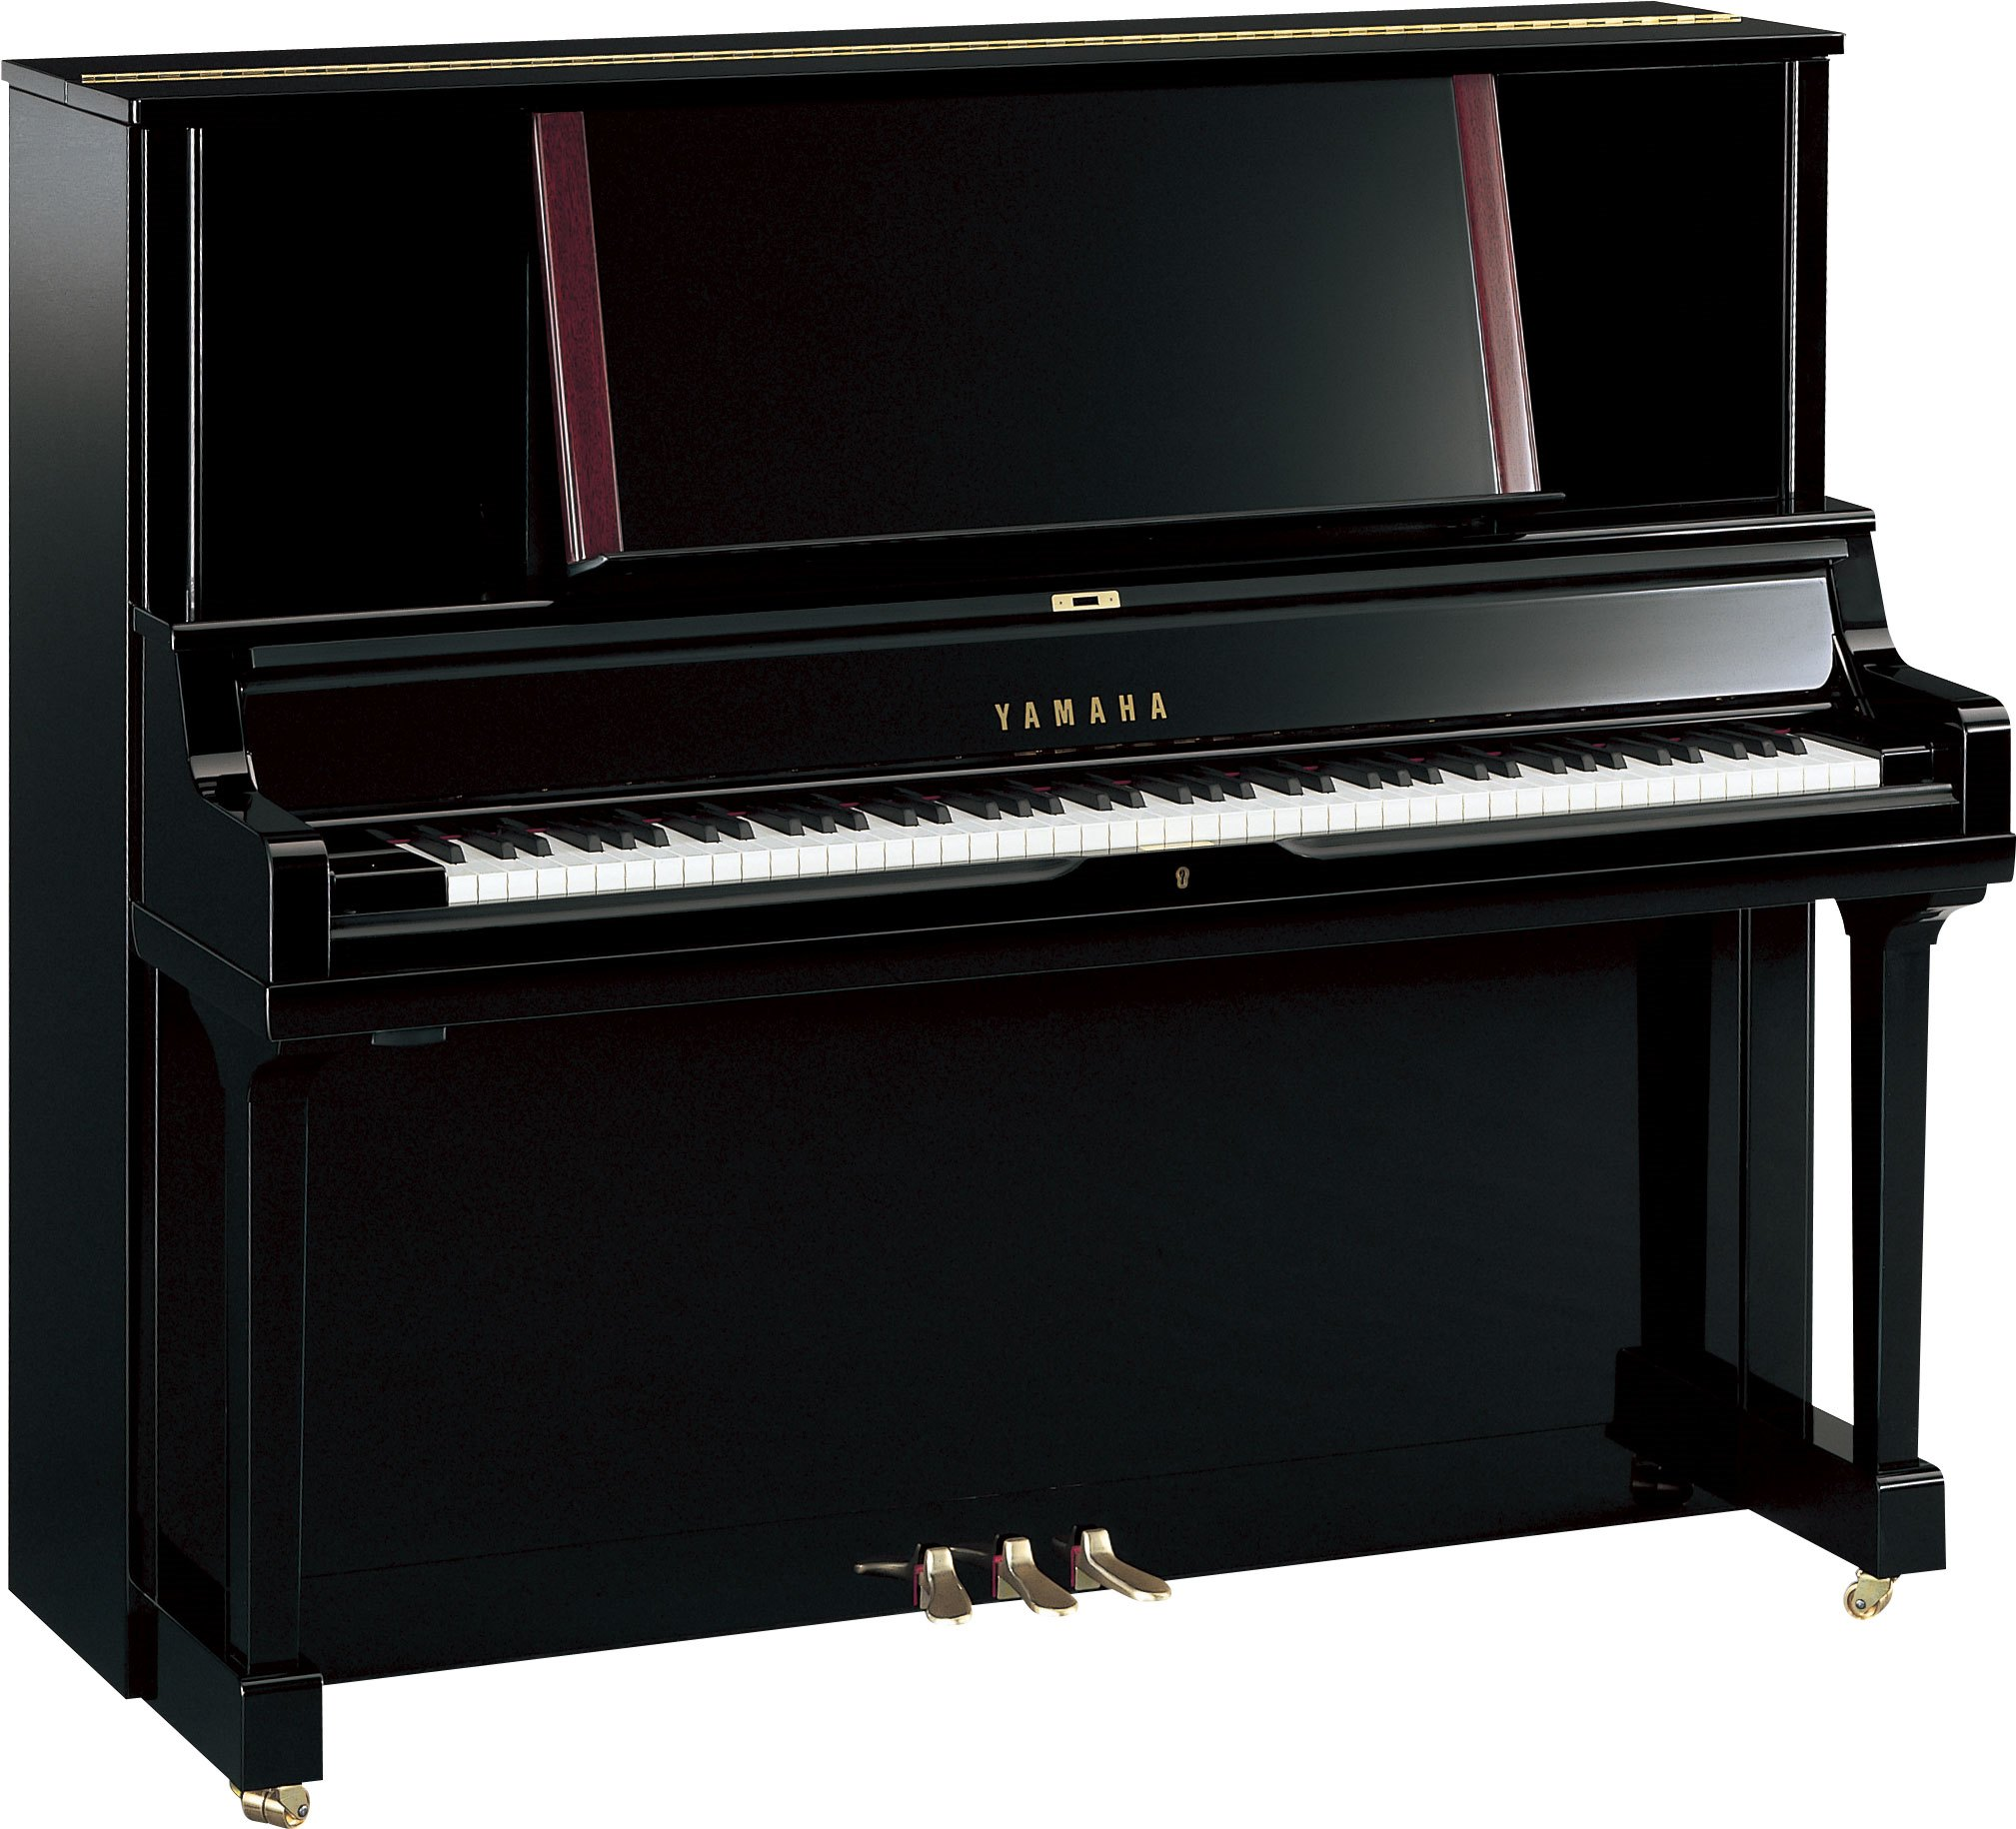 E Piano Yamaha : yus series overview upright pianos pianos musical instruments products yamaha uk ~ Aude.kayakingforconservation.com Haus und Dekorationen